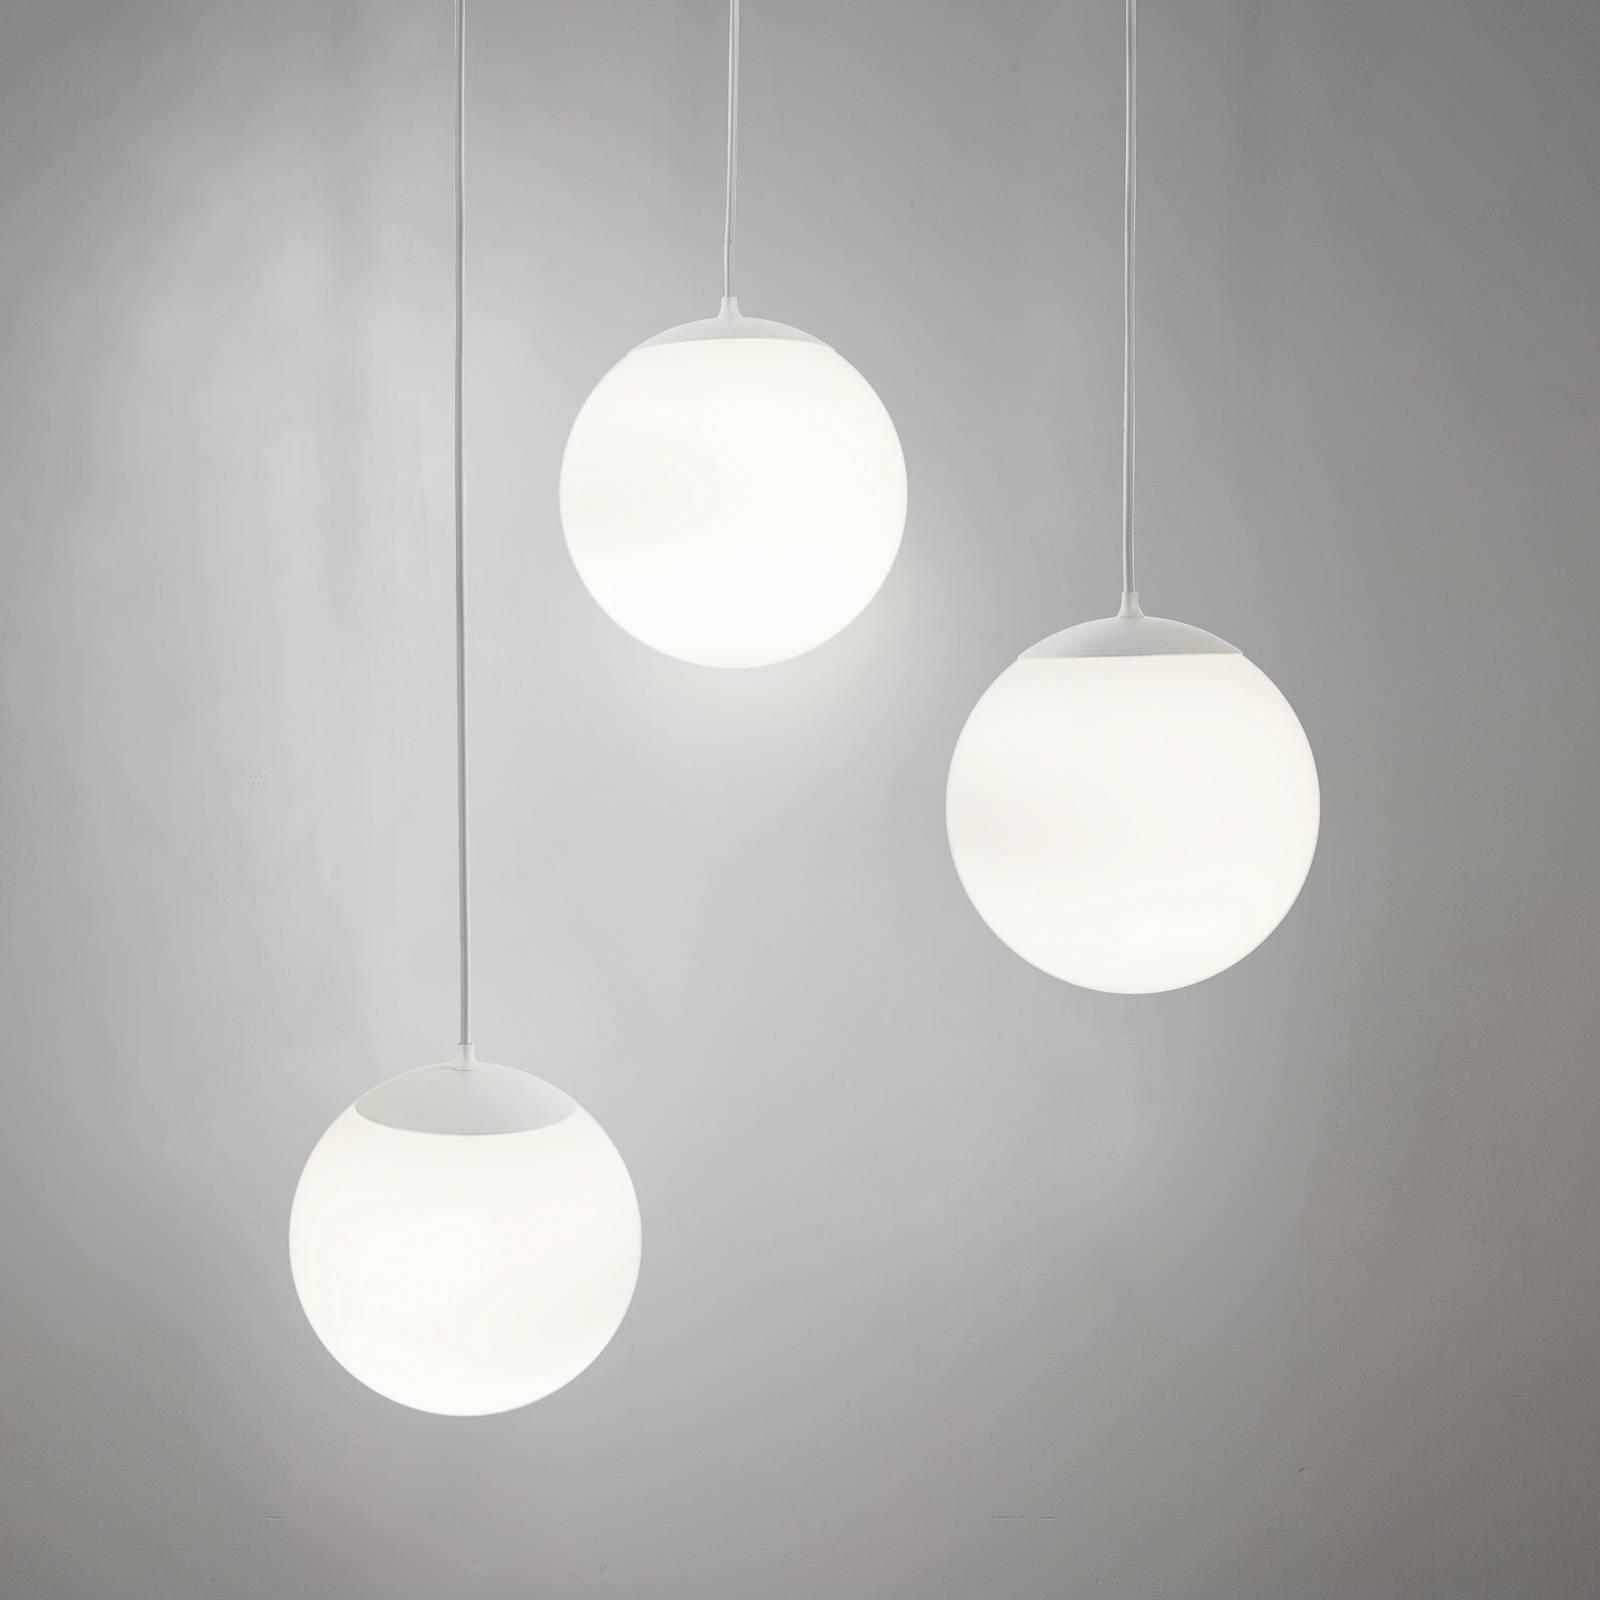 Innermost Drop hanglamp, wit, Ø 40 cm